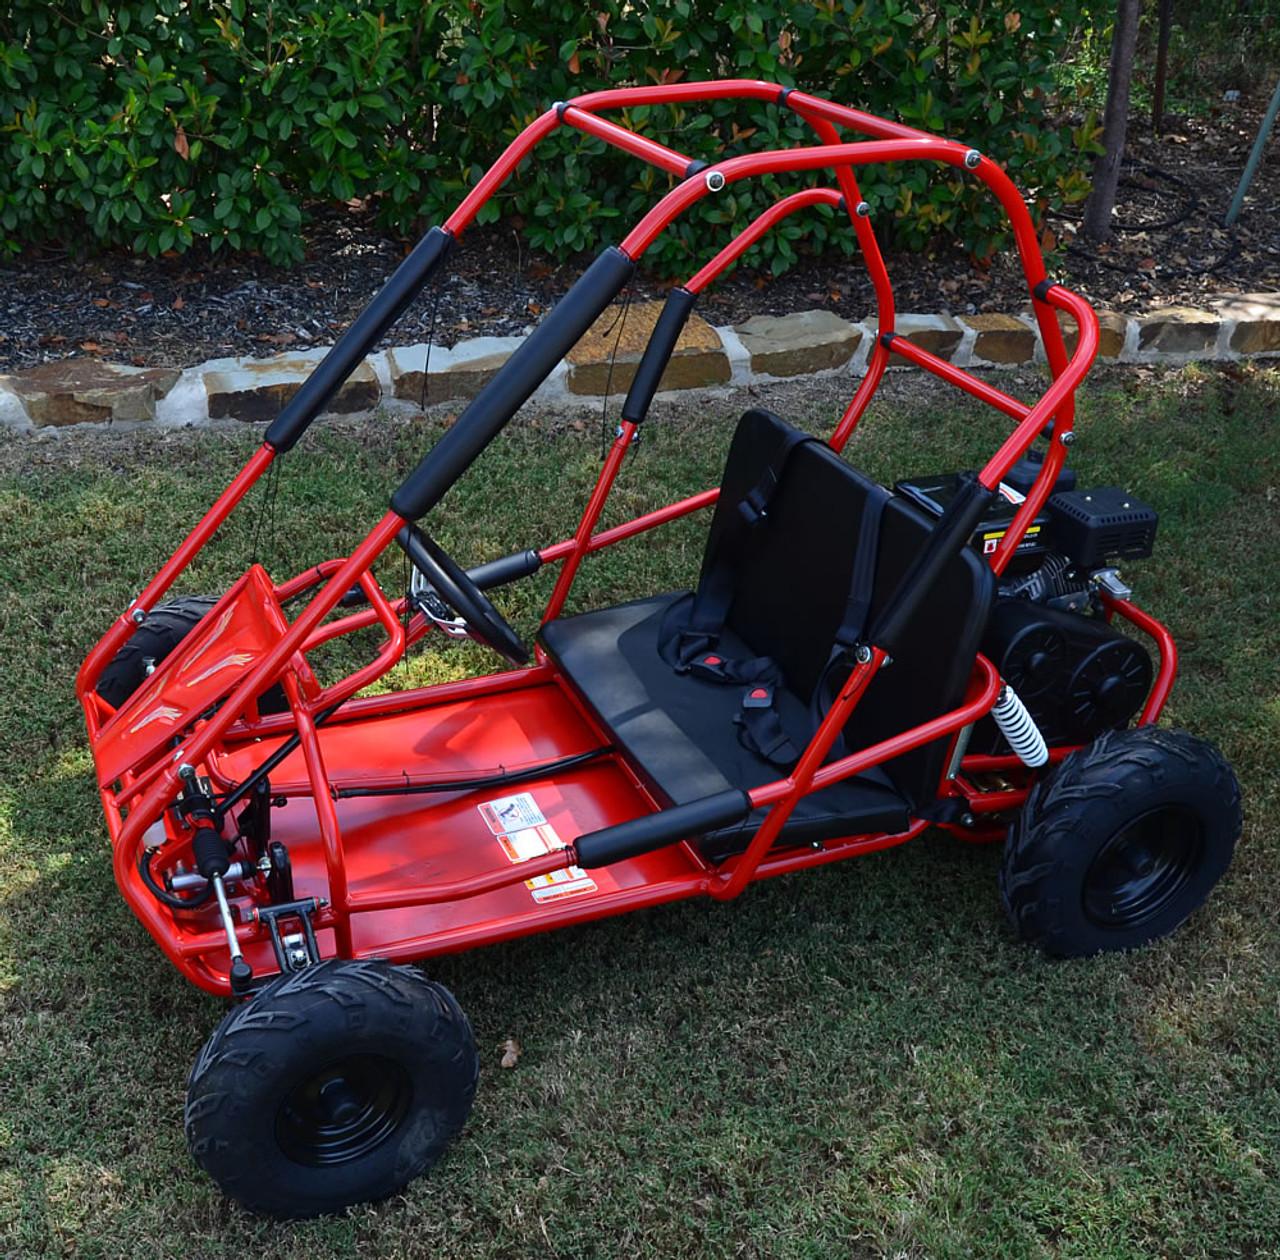 GoPowerSports Standard Mid Size Go-Kart Kit - GoPowerSports.com